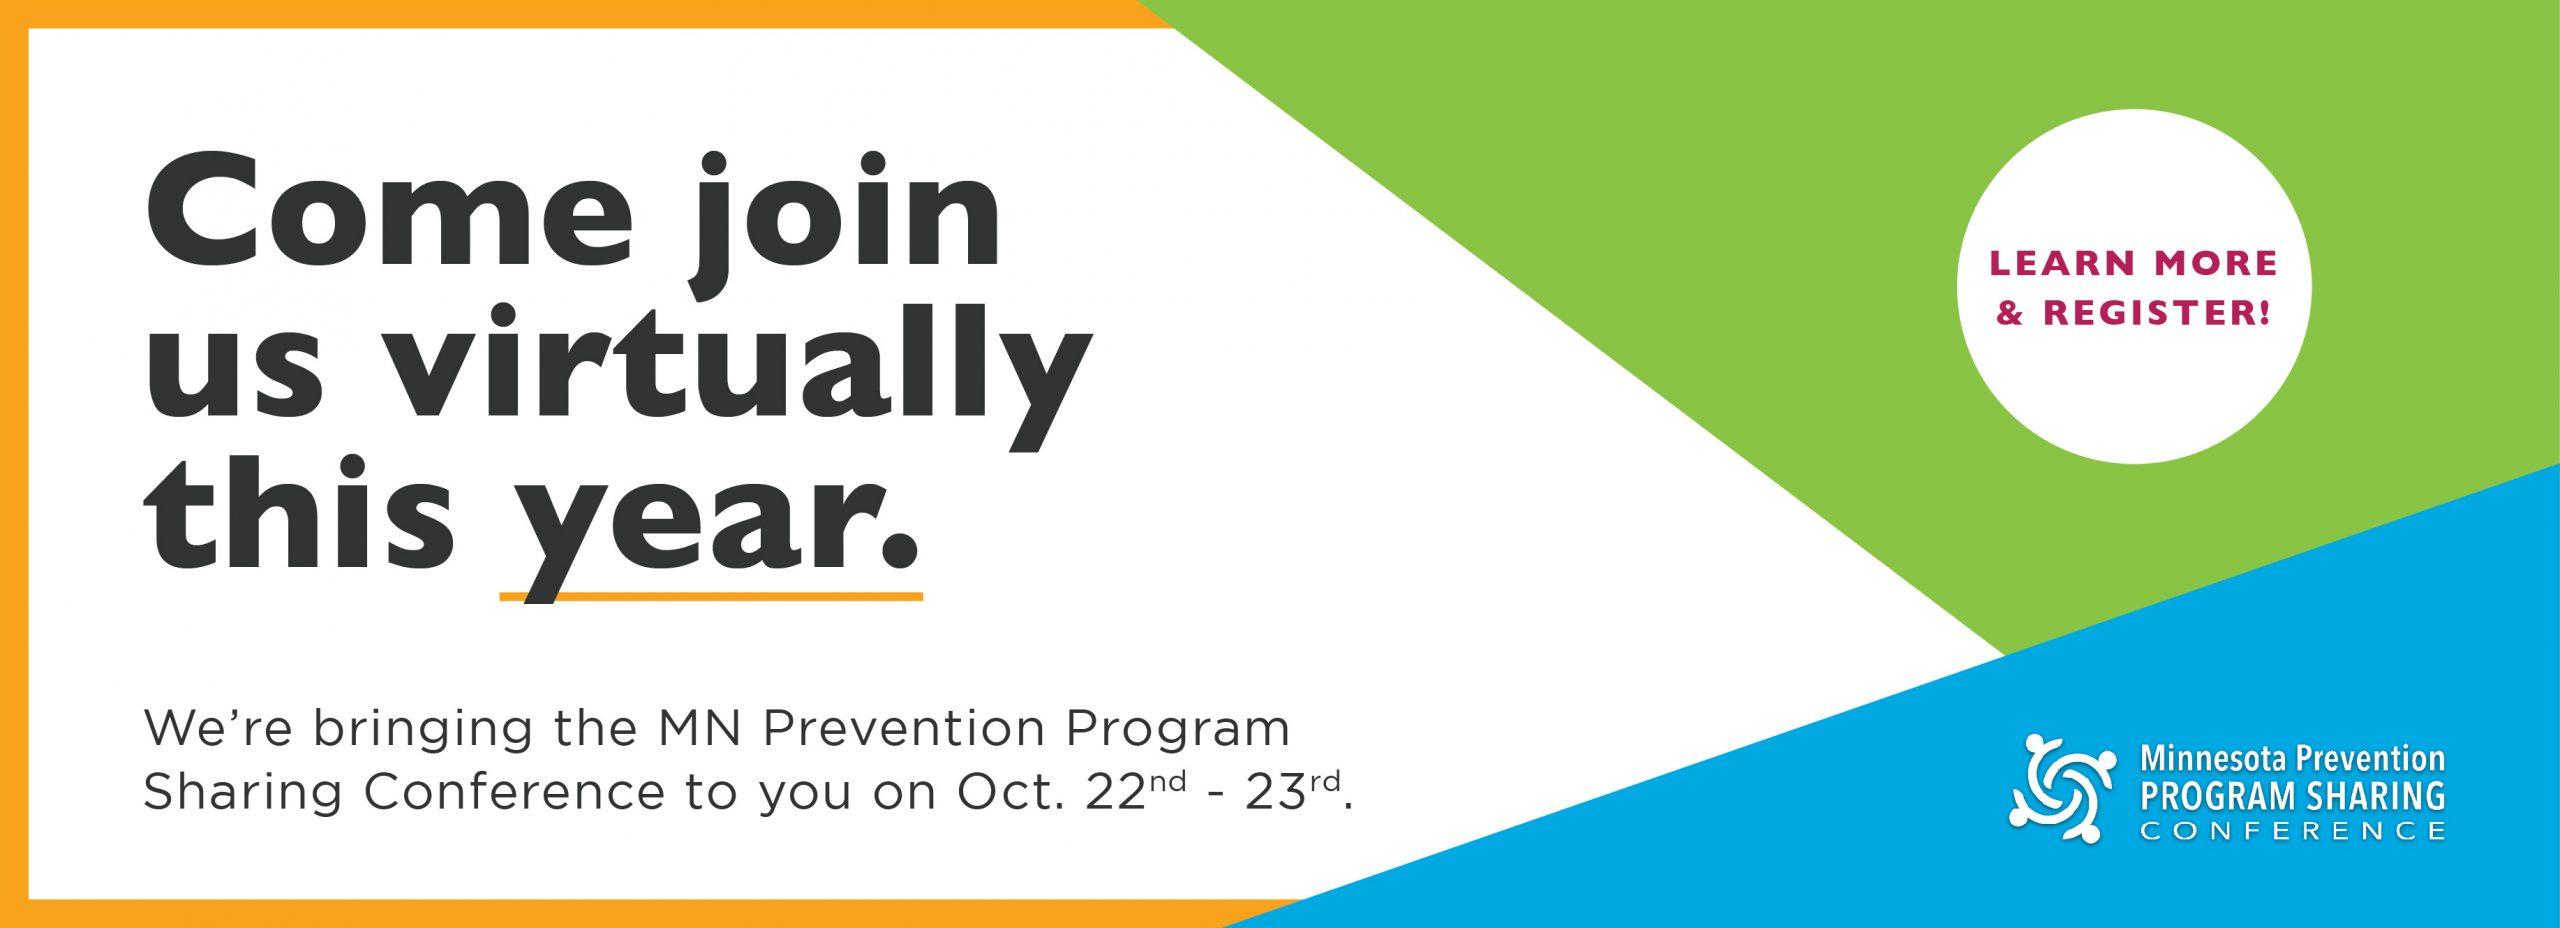 2020 Minnesota Prevention Program Sharing Conference